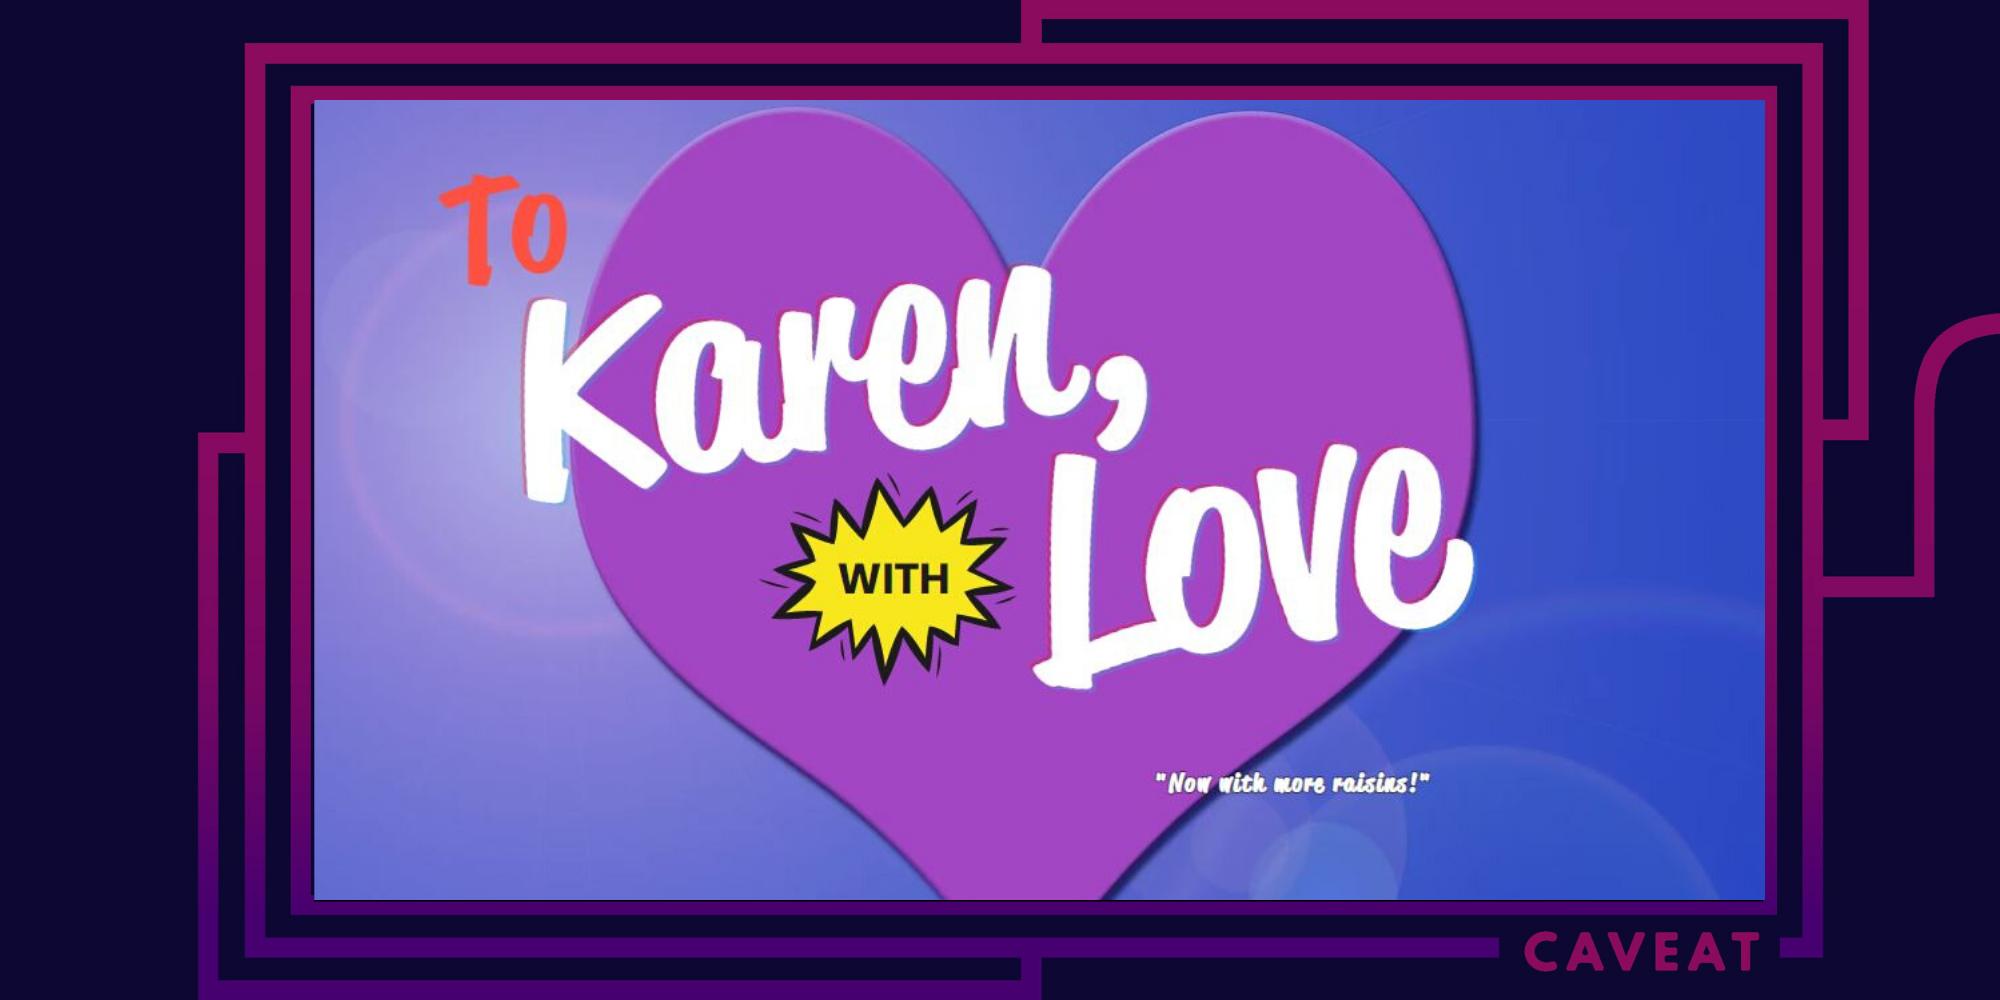 To Karen, With Love